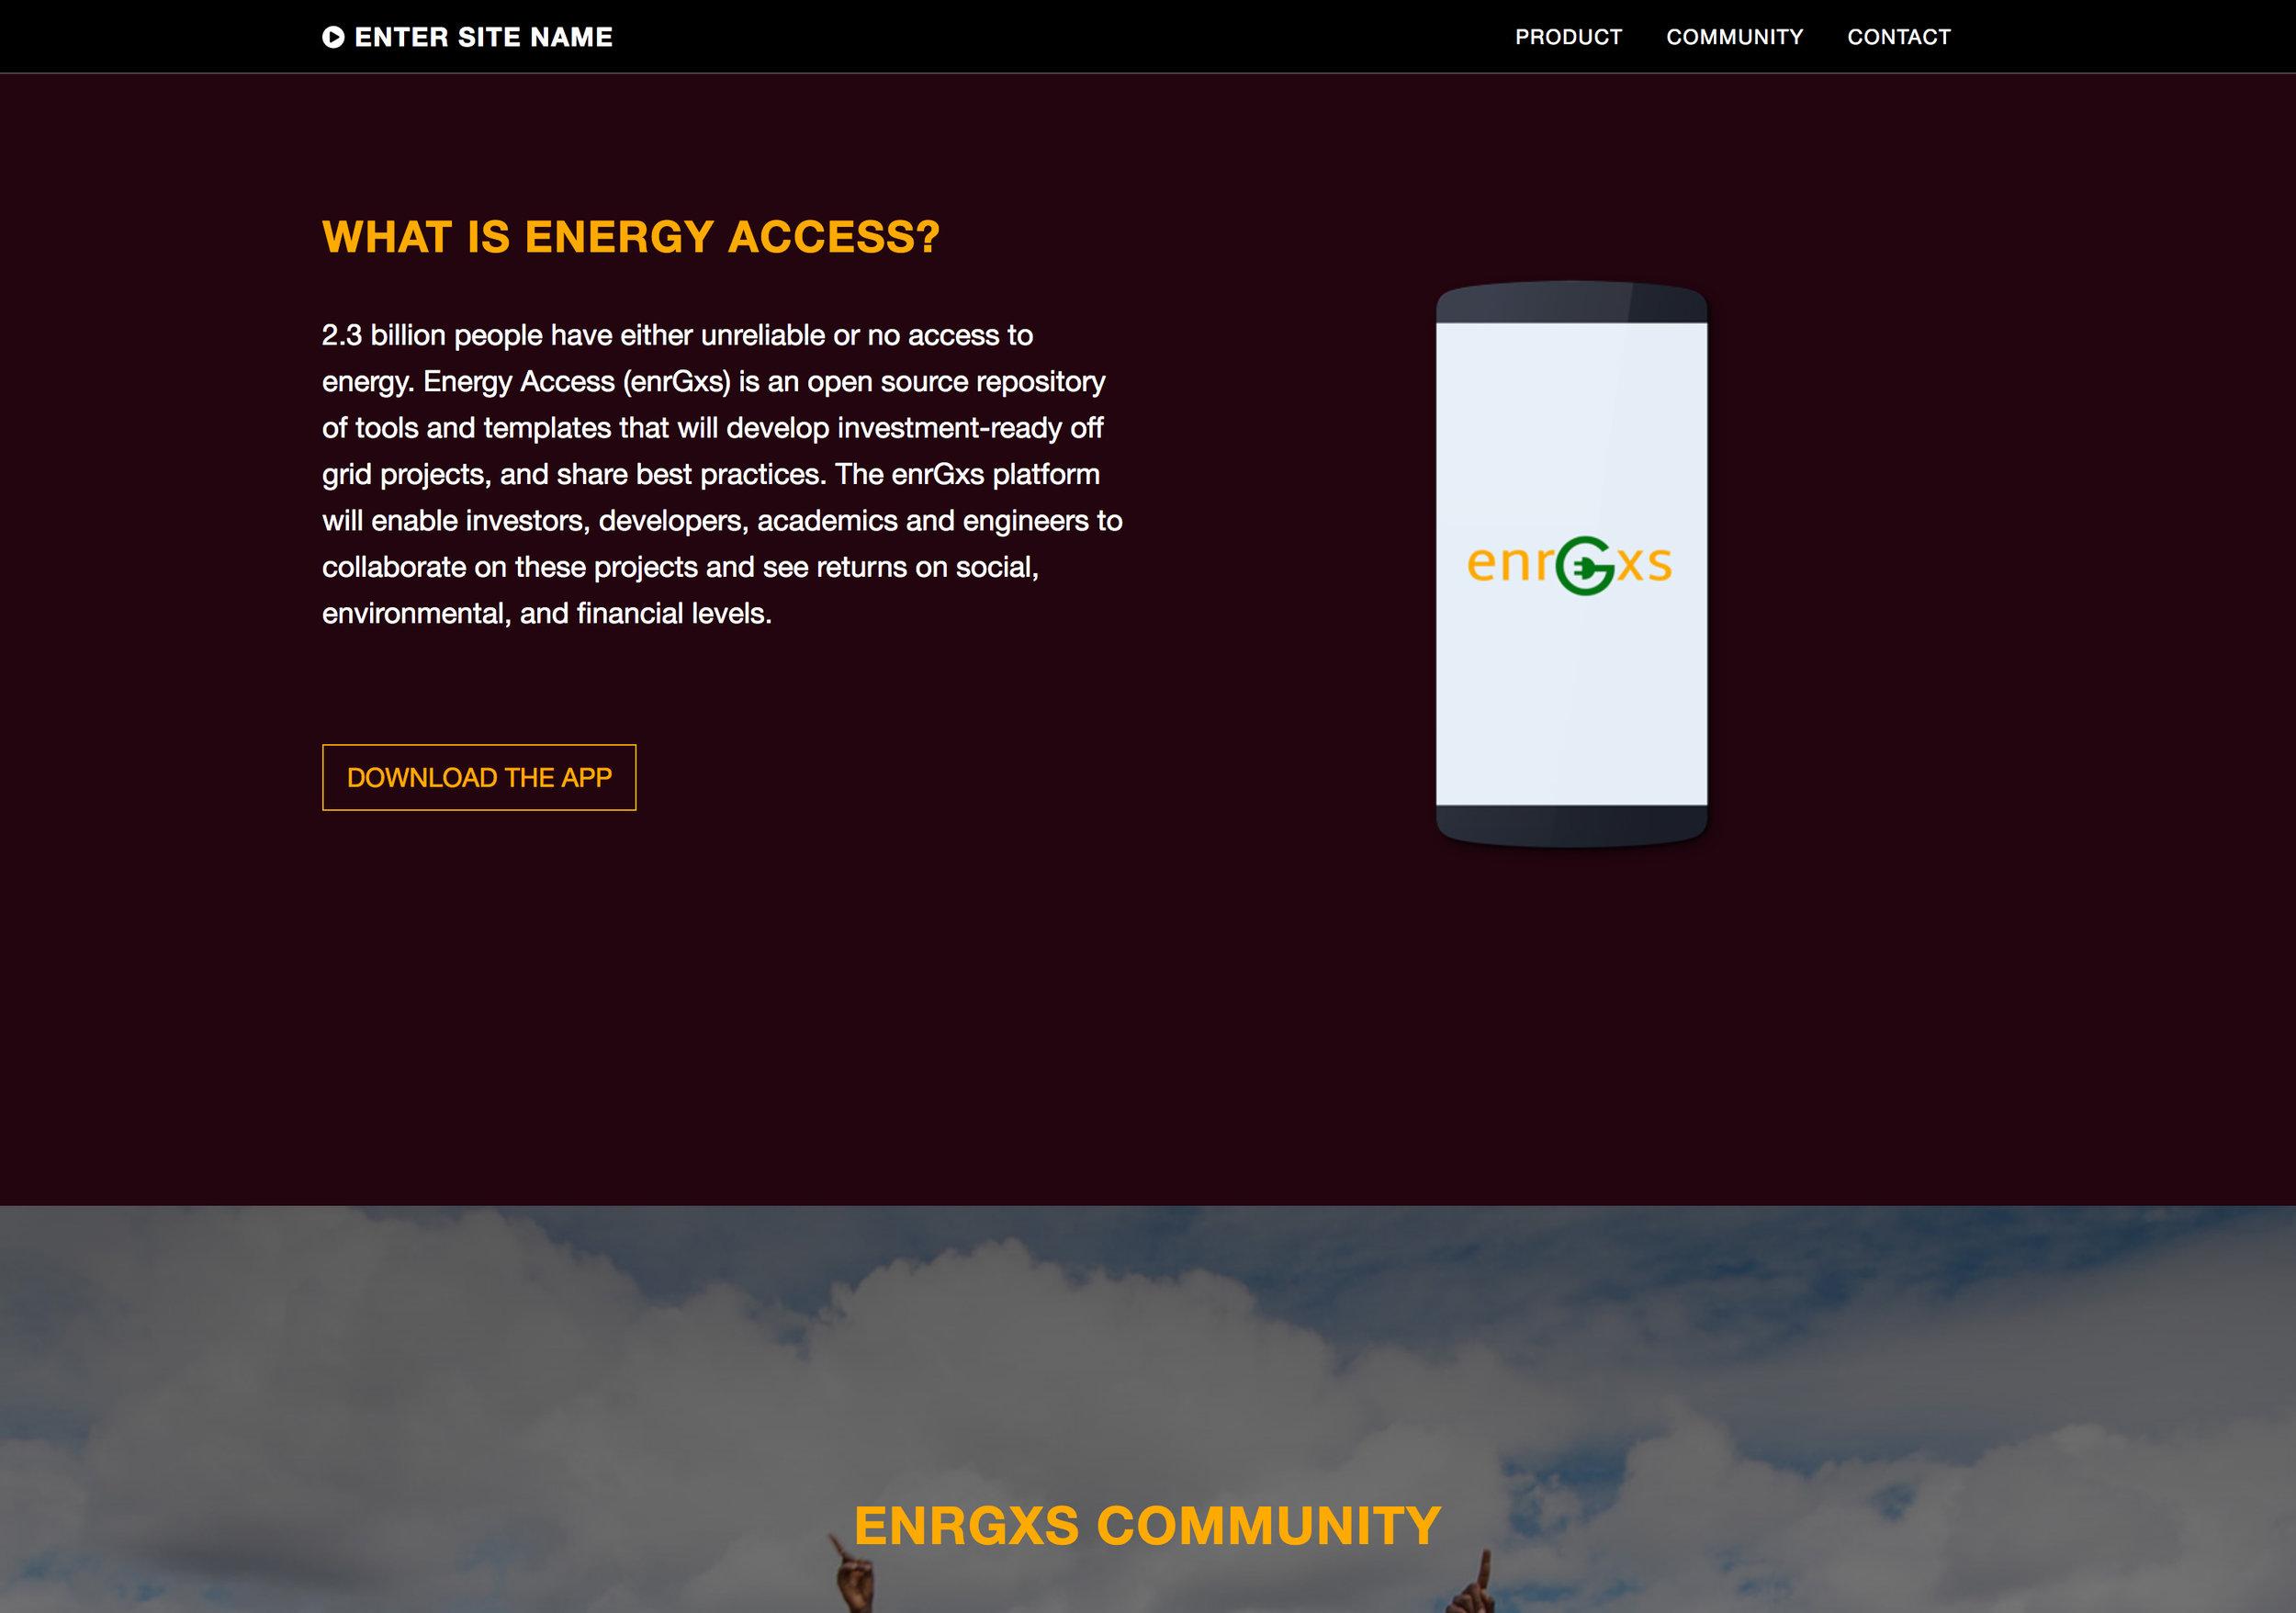 enrgxs_website_06.jpg